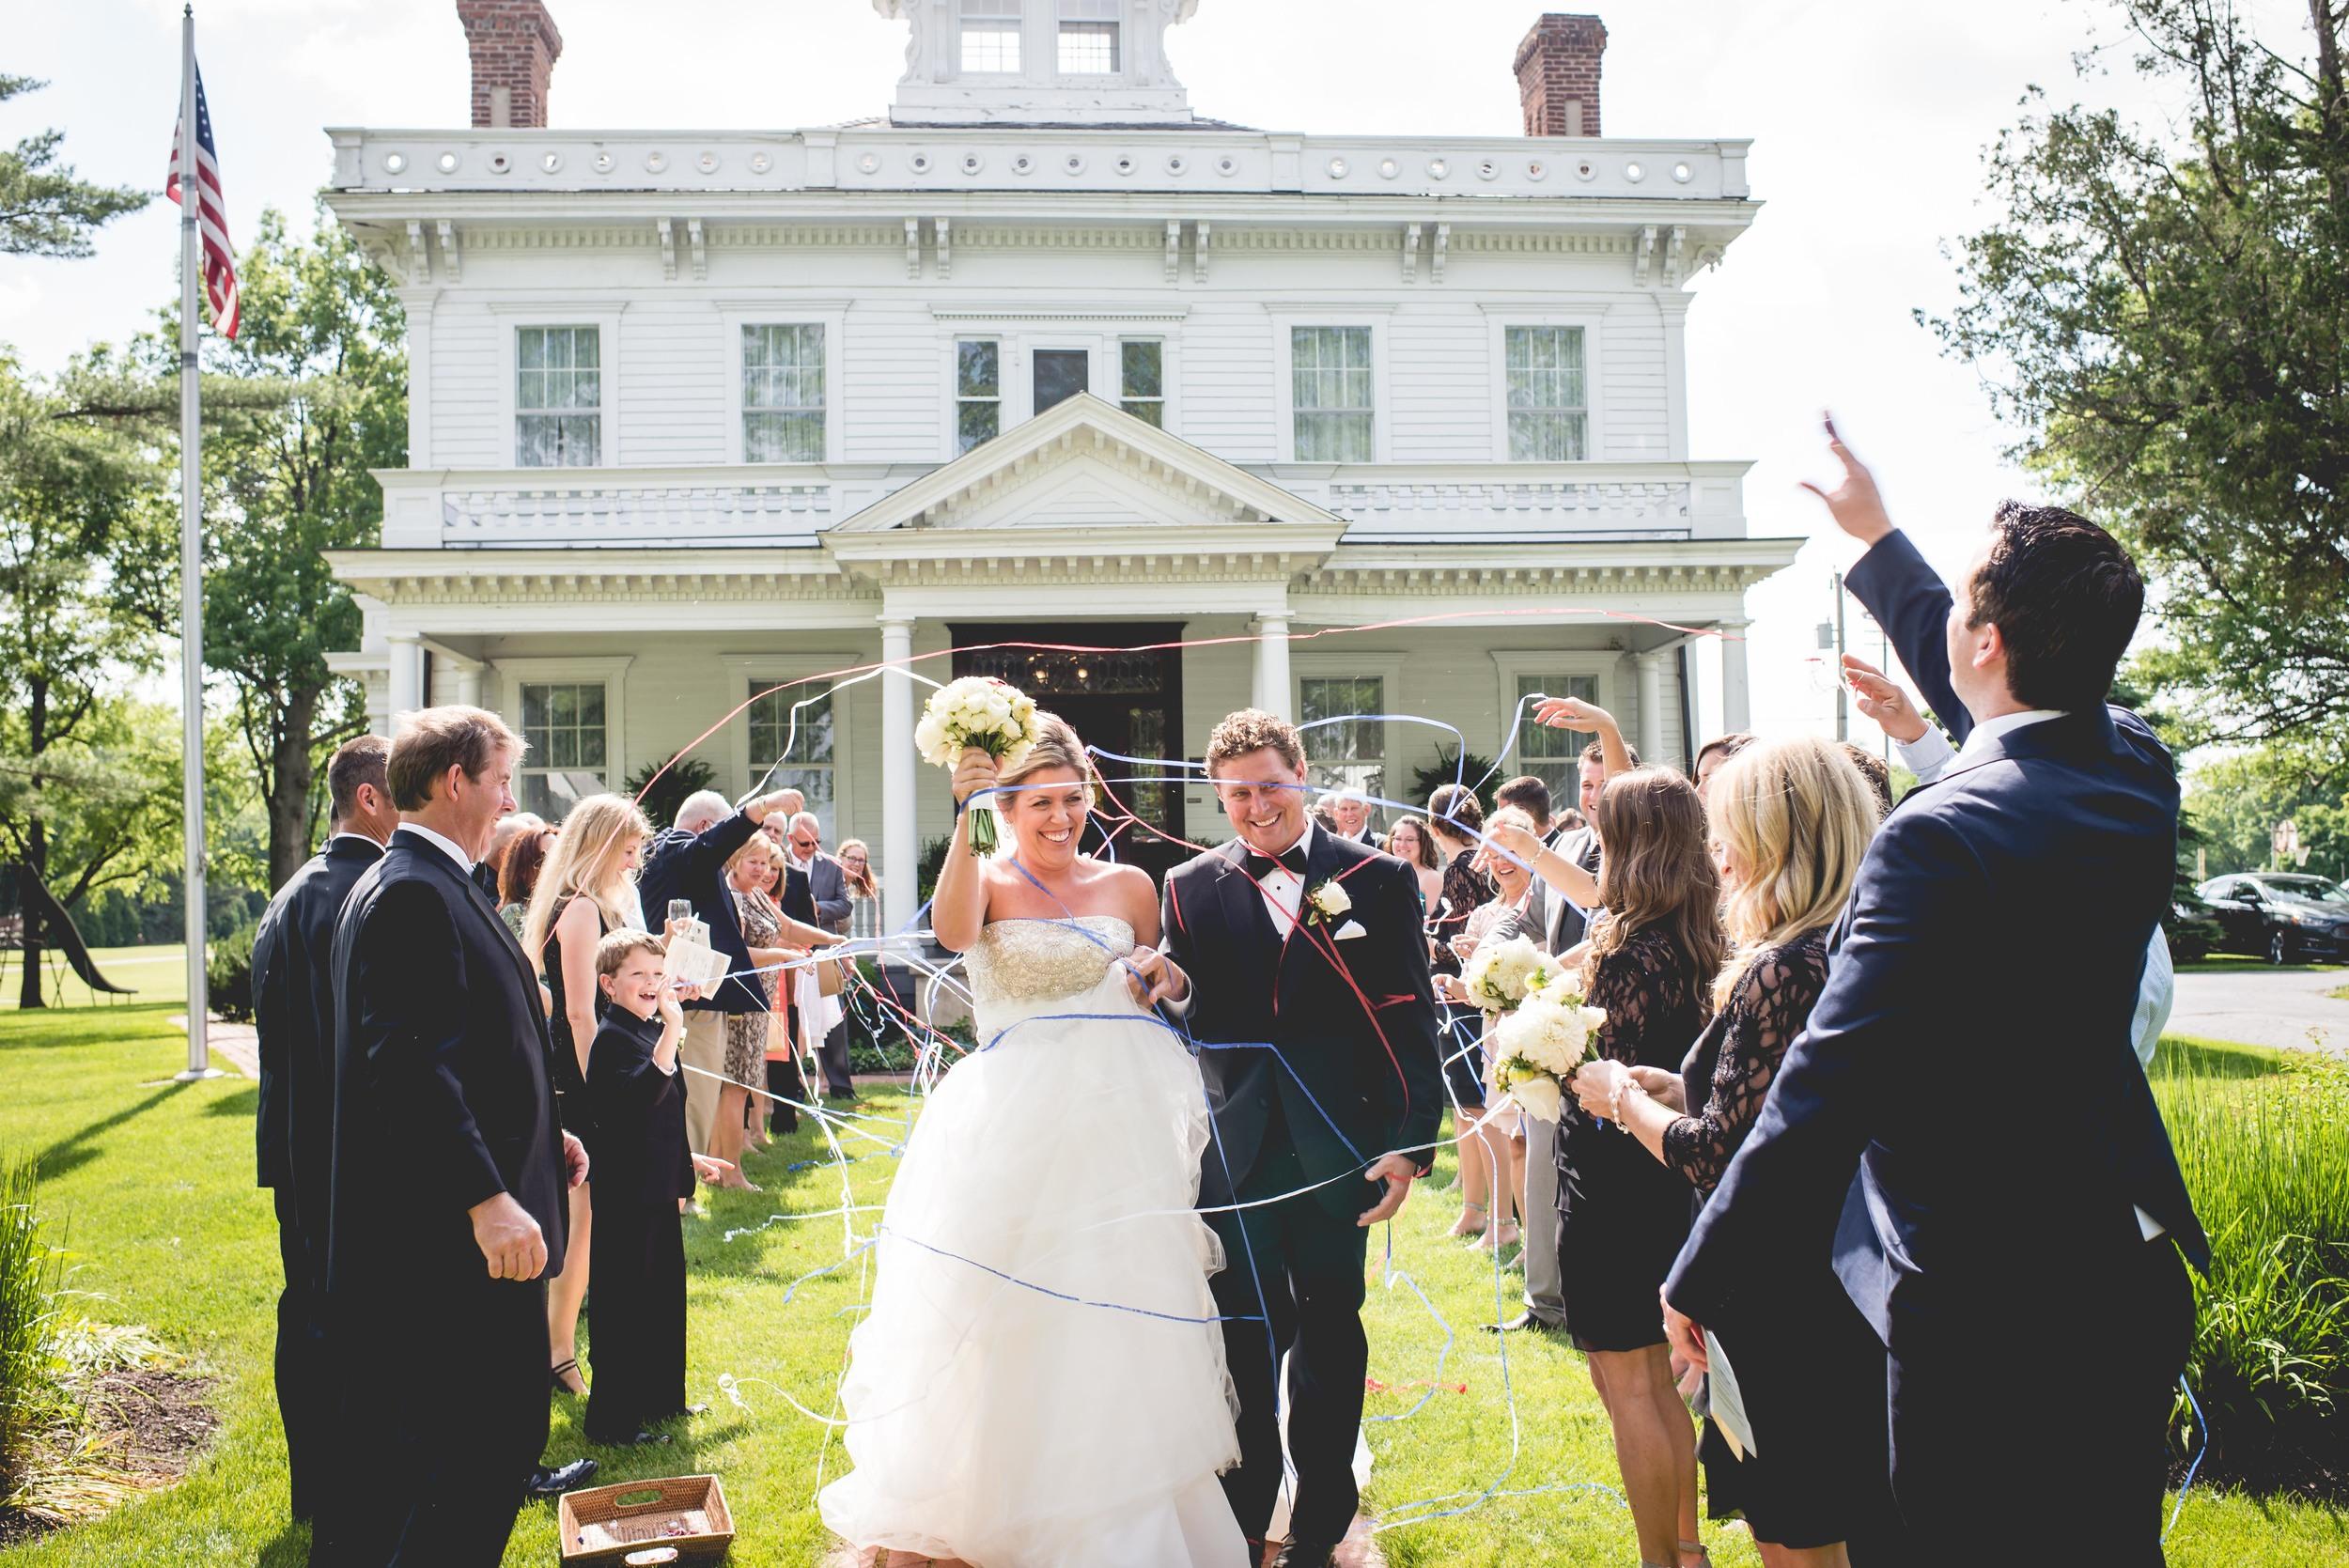 sarasutterphotography_leeandshalon_wedding_2015-416.jpg